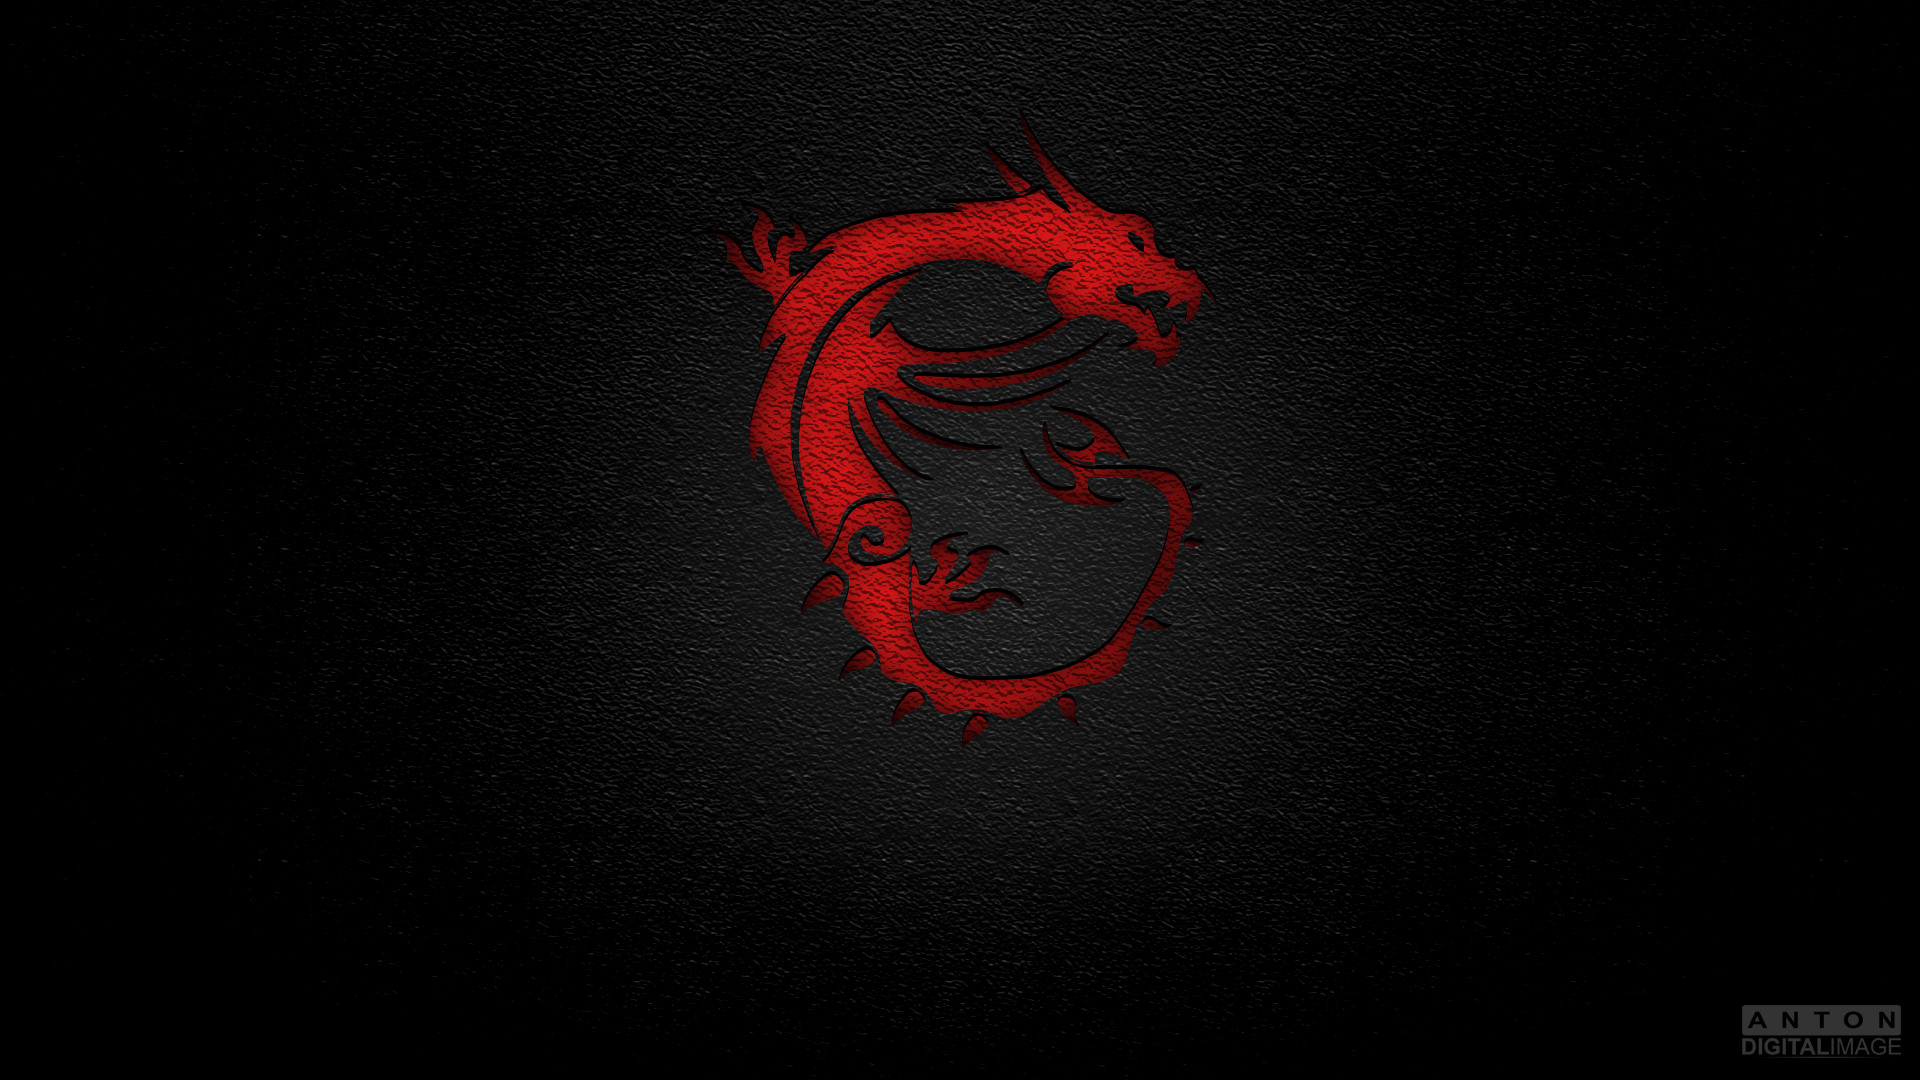 MSI Dragon Gaming Series Wallpaper 1080p by Thony32 on DeviantArt